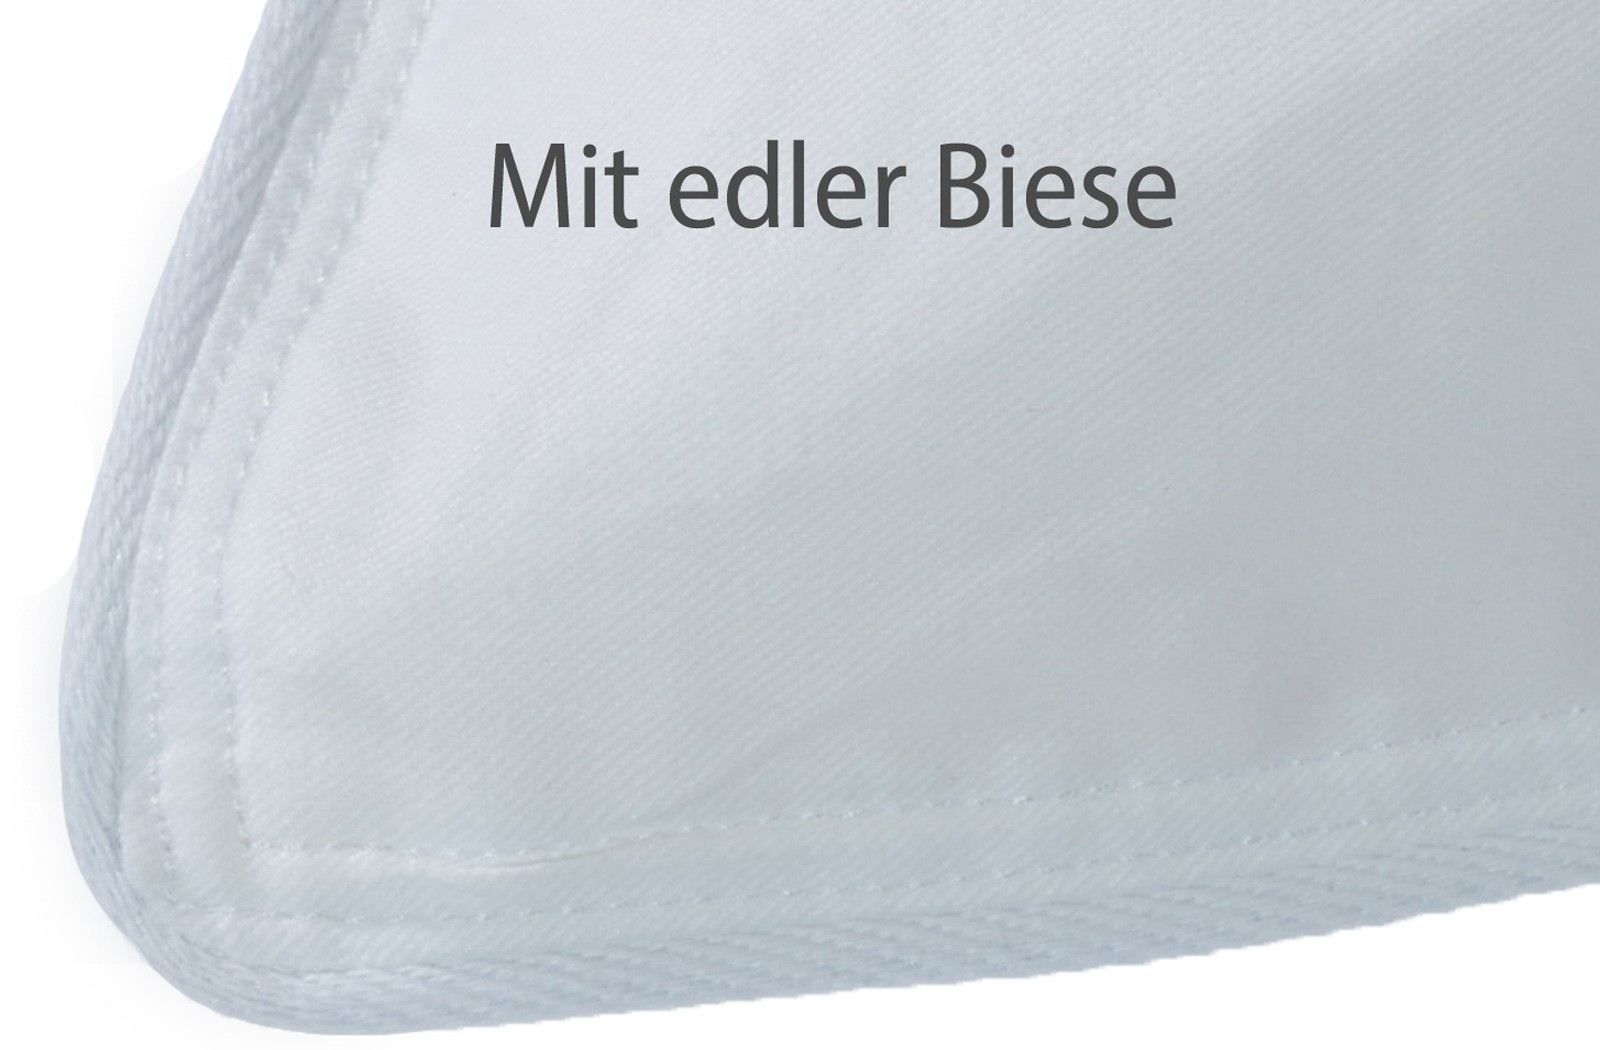 2x Kopfkissen 30% Gänse-Daunen Kissen Federn Klasse 1 40x80 Christin – Bild 3